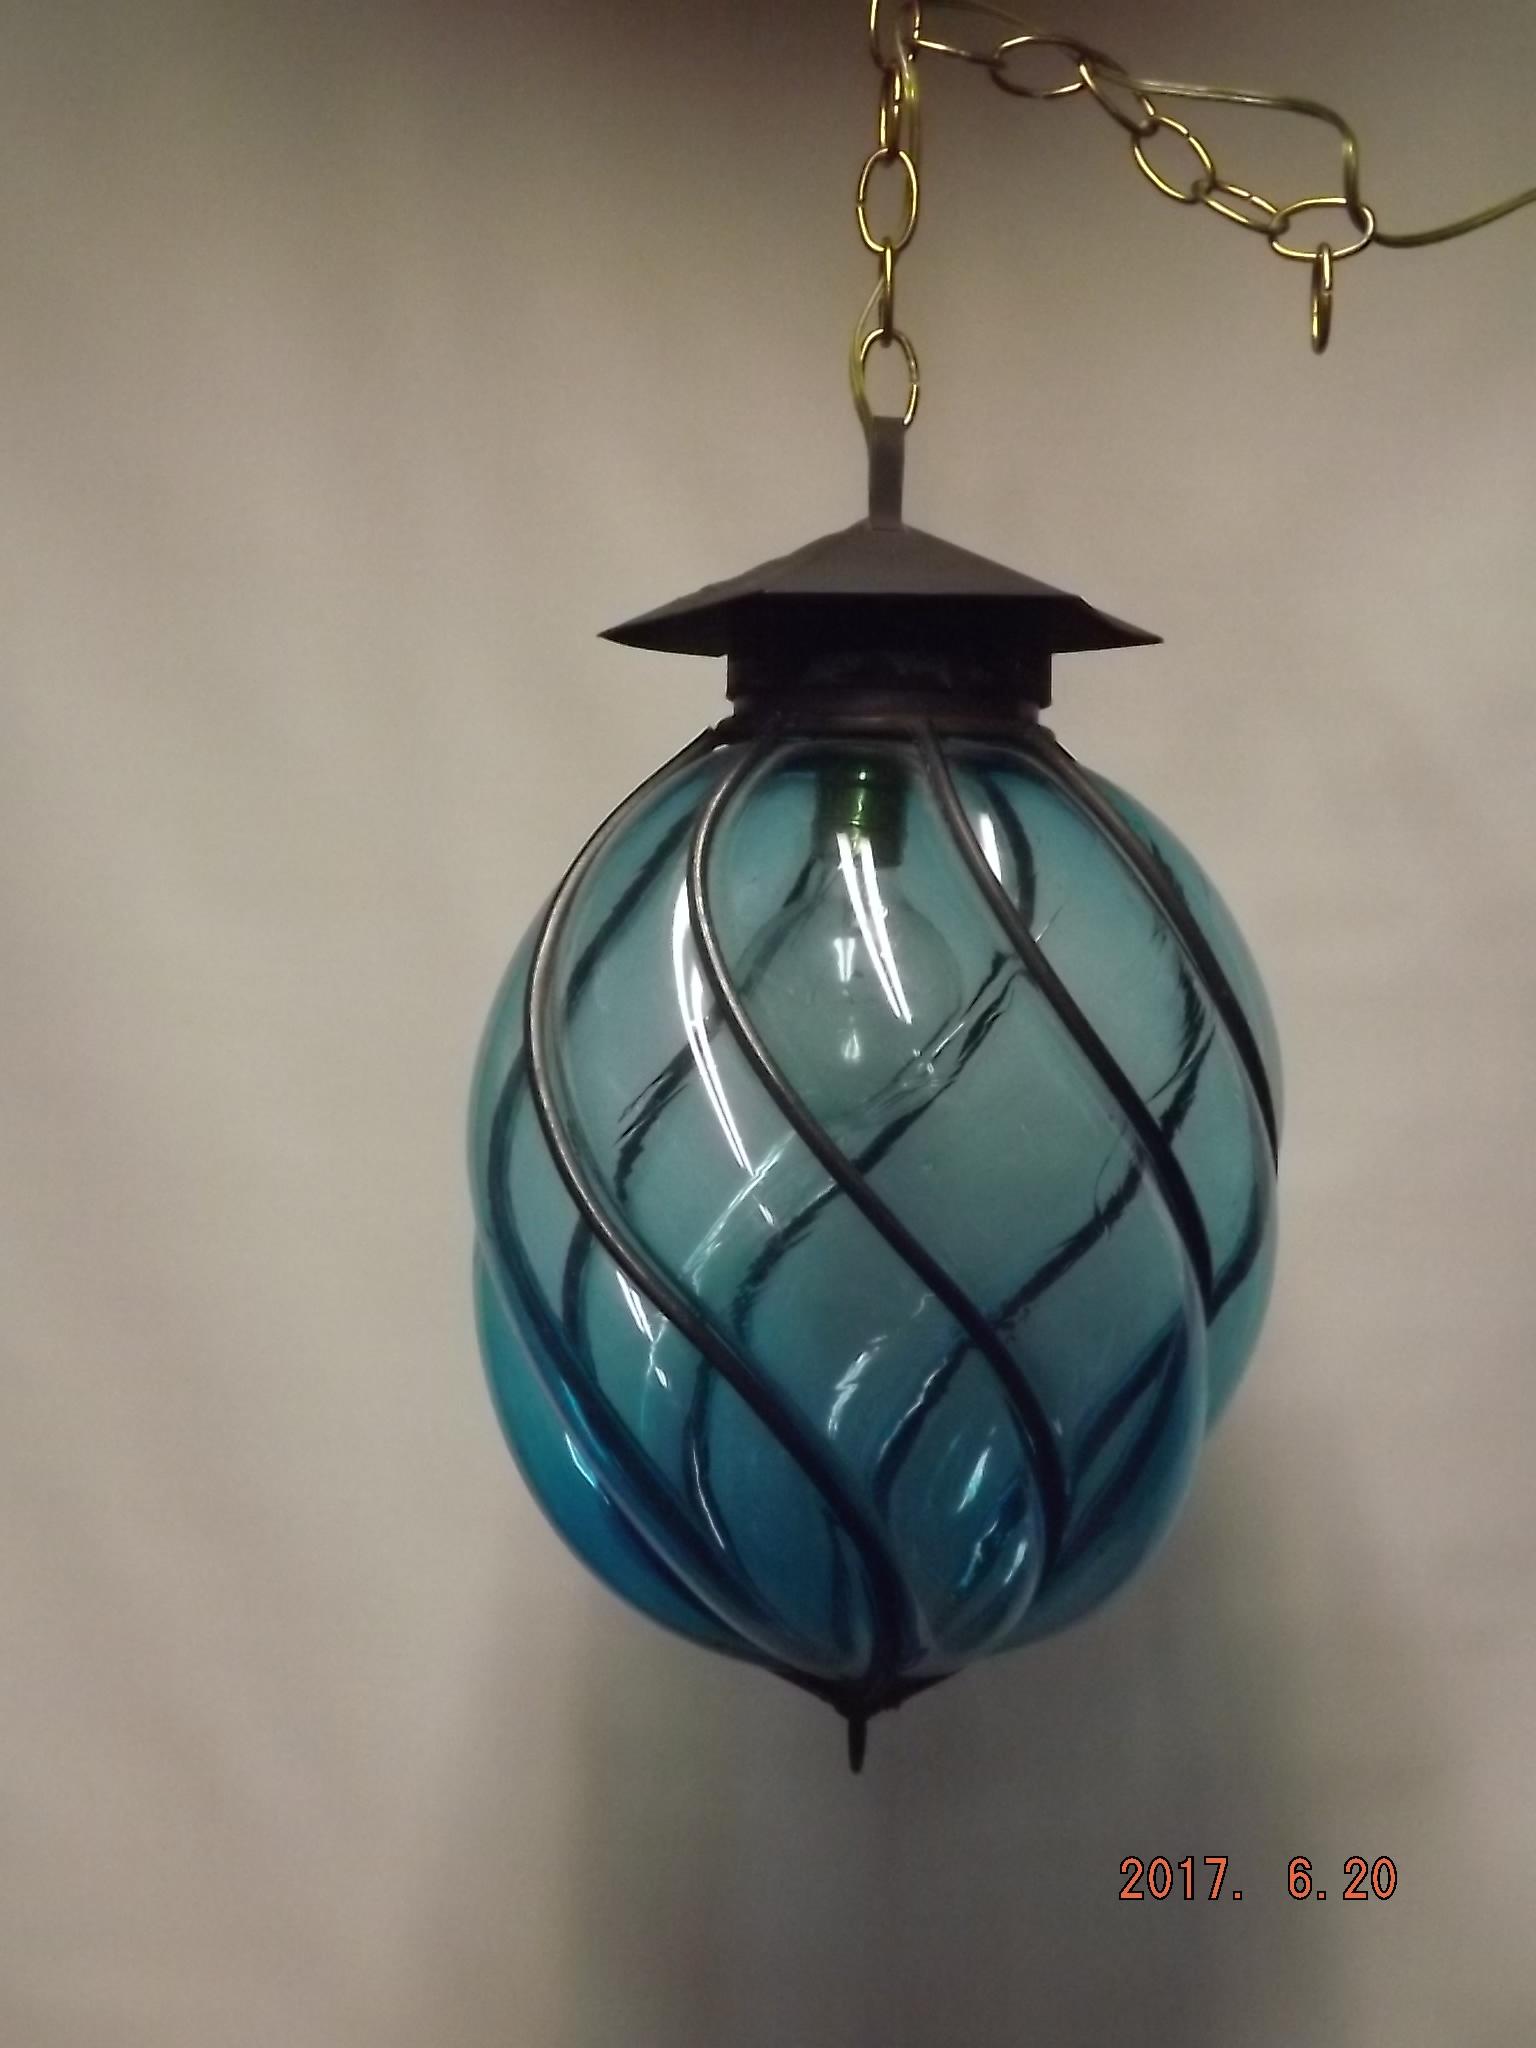 Electric fixture - Blue globe